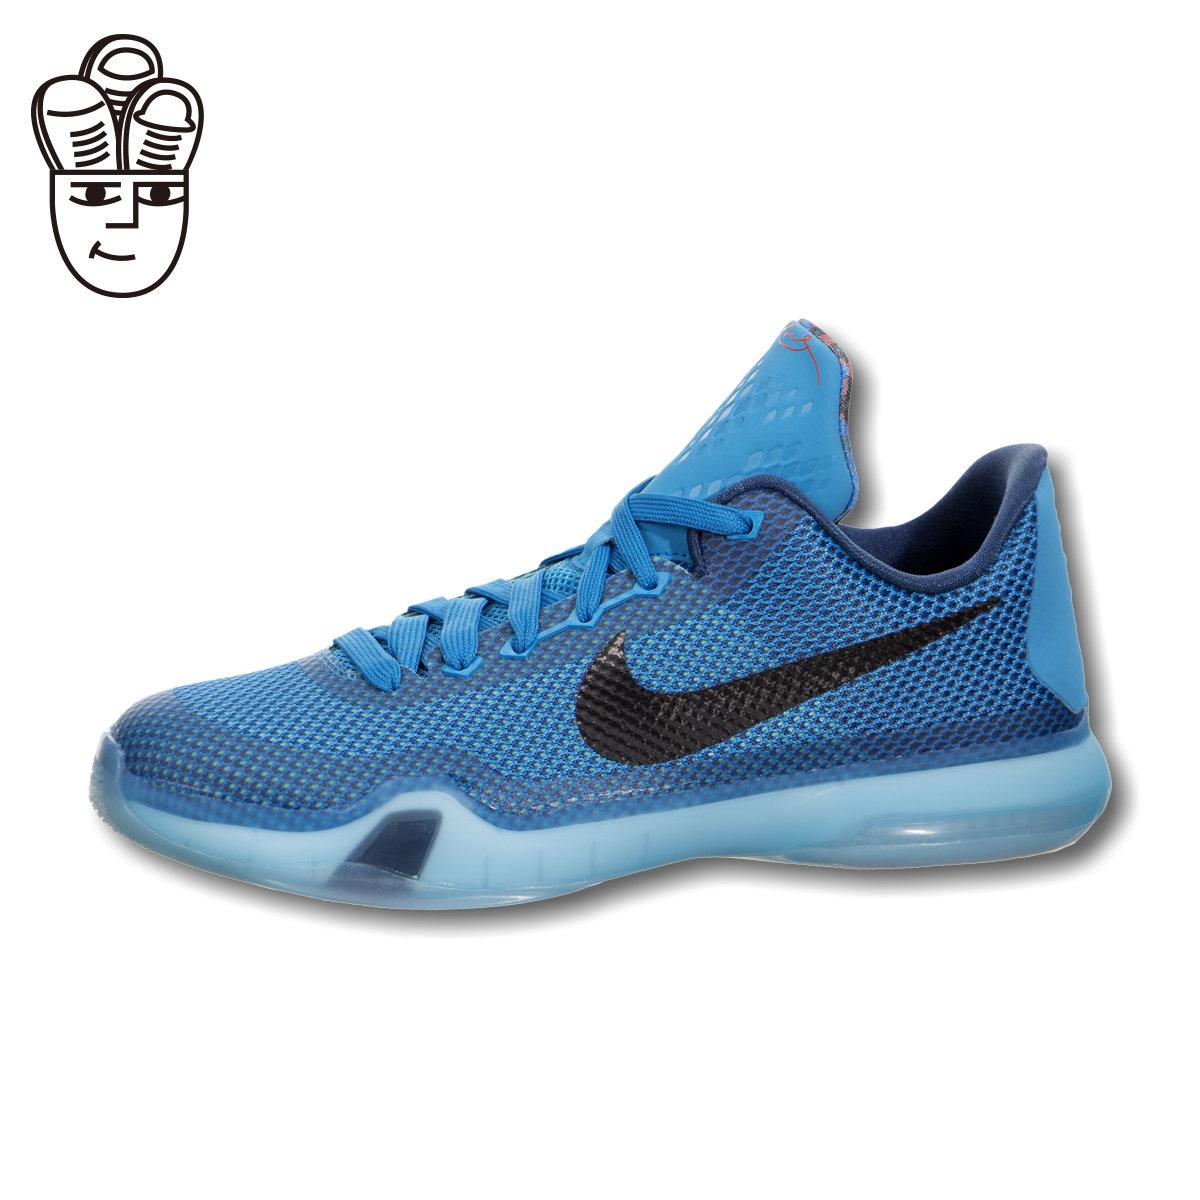 0082f3633c95 Get Quotations · Nike nike kobe kobe x x reeboks new generation of  basketball shoes to help low men gs